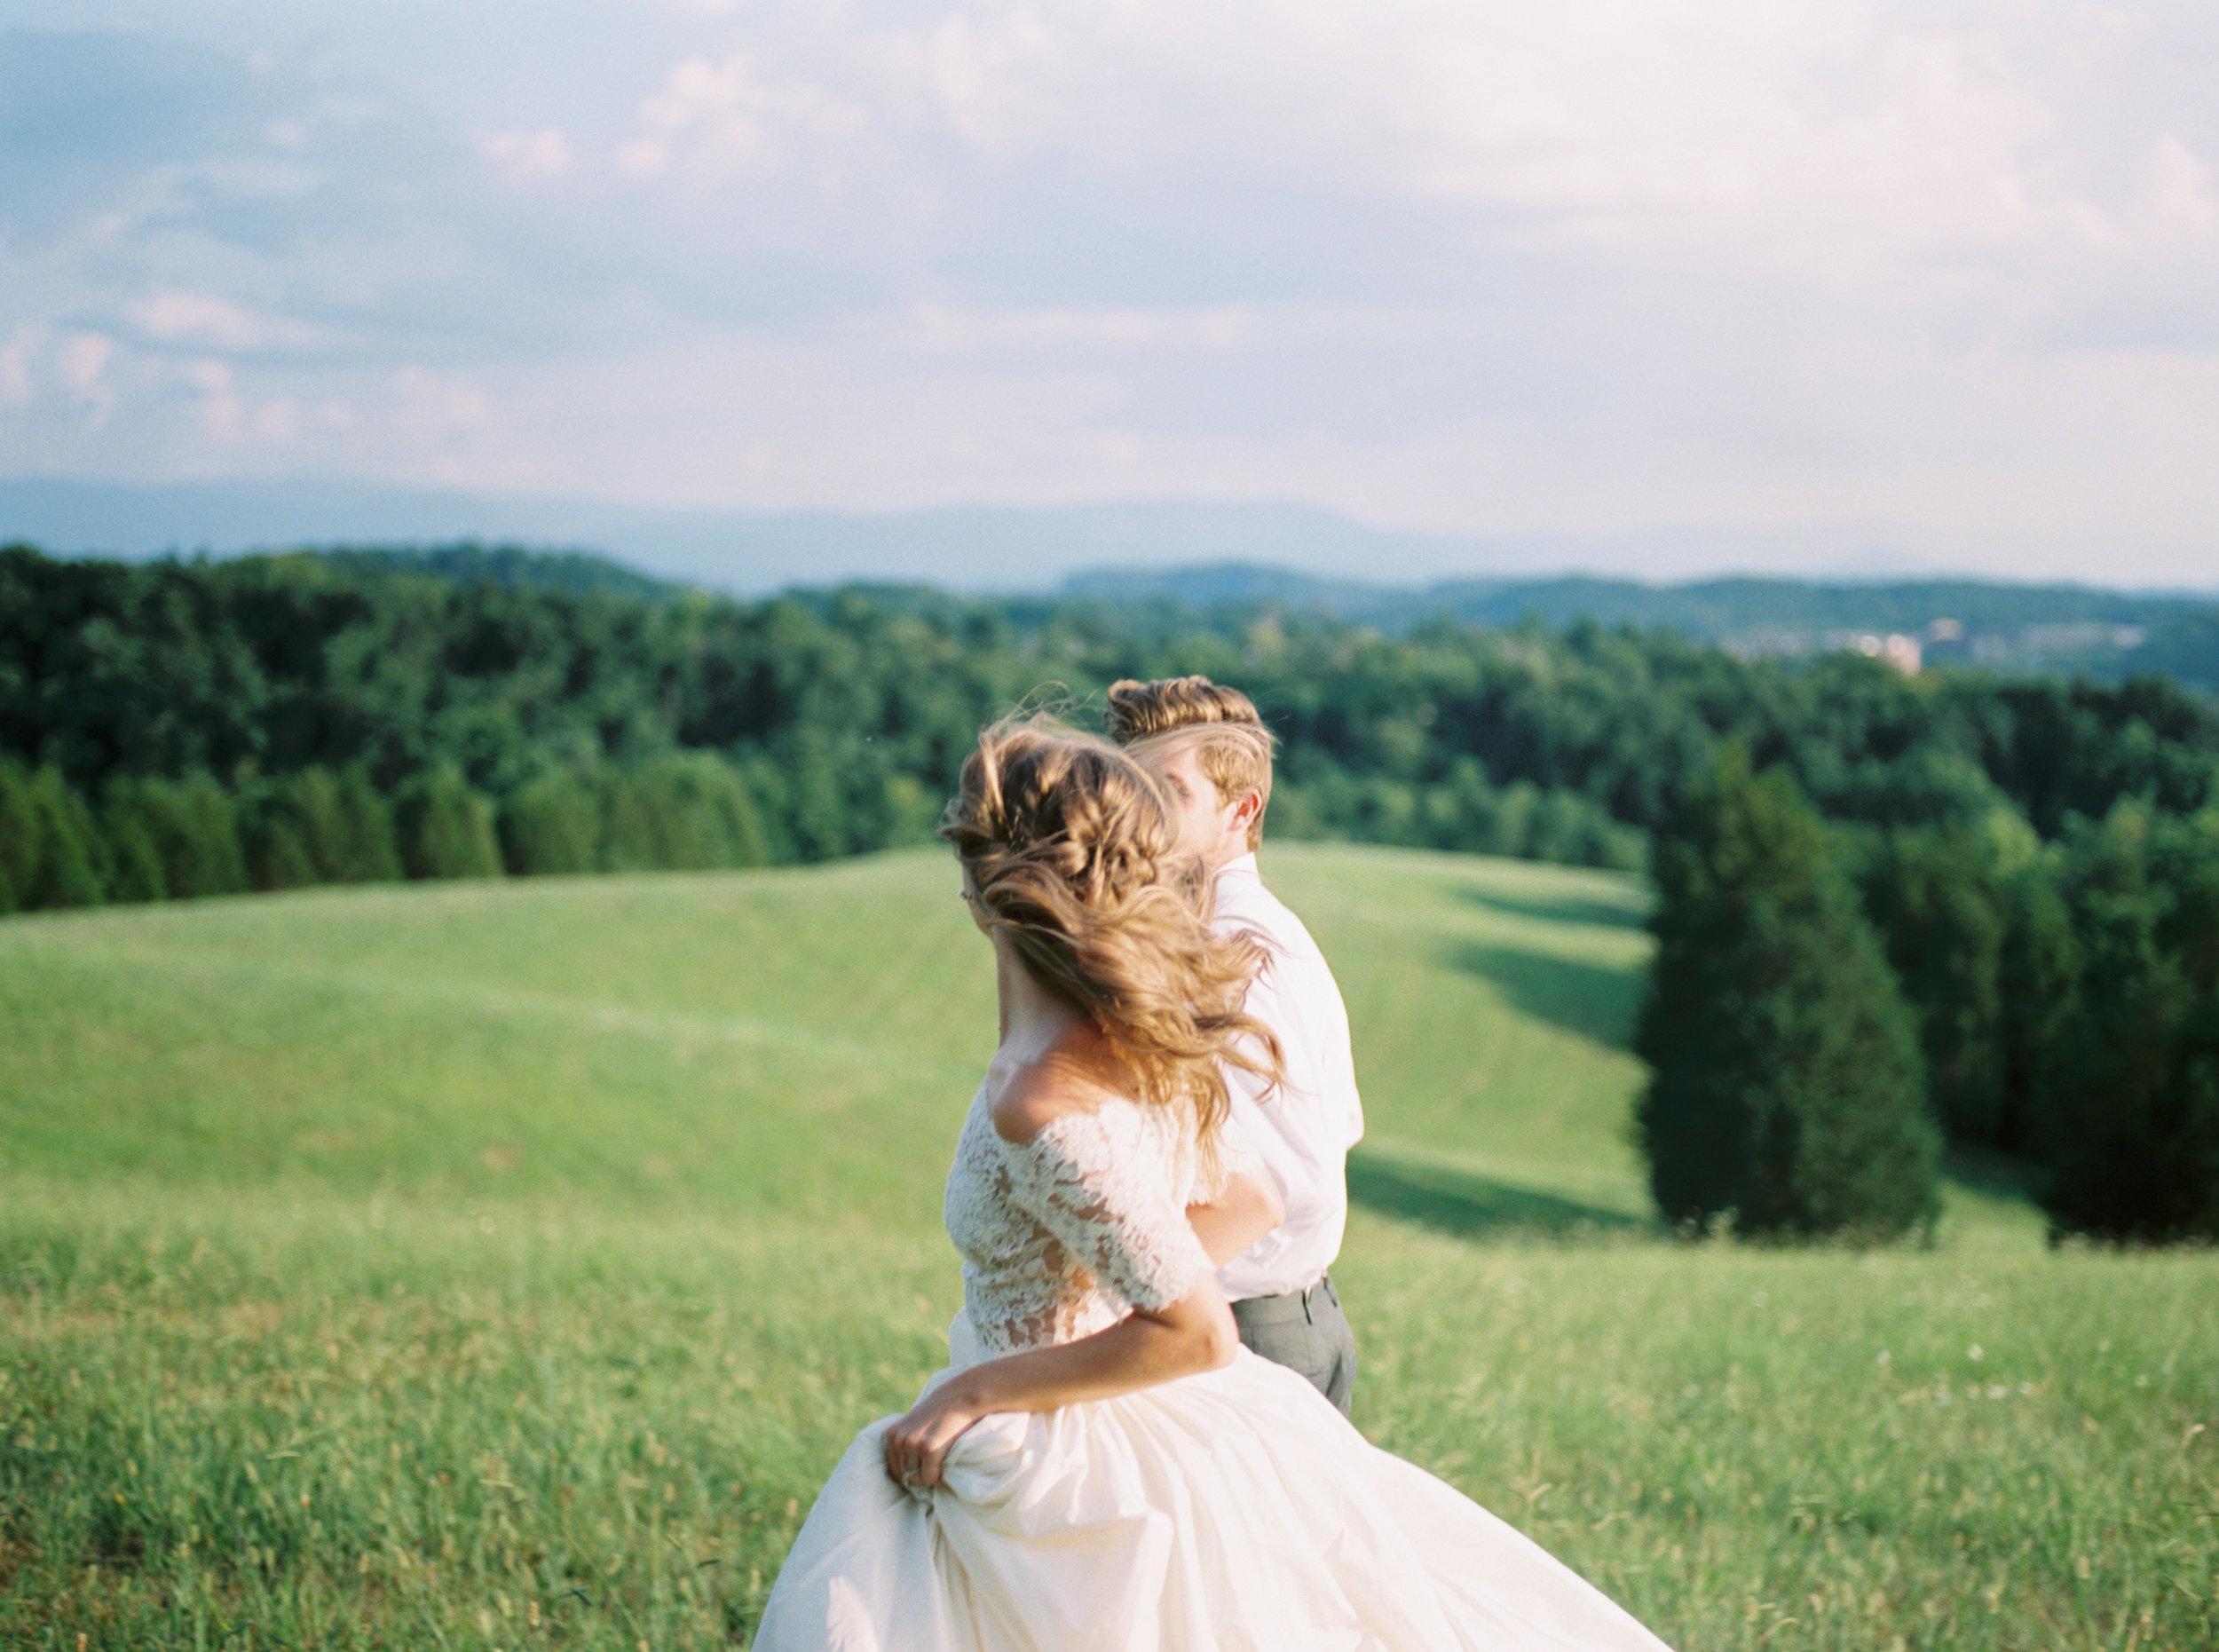 Sevier_Blumen_Editorial_Abigail_Malone_Photography-123.jpg